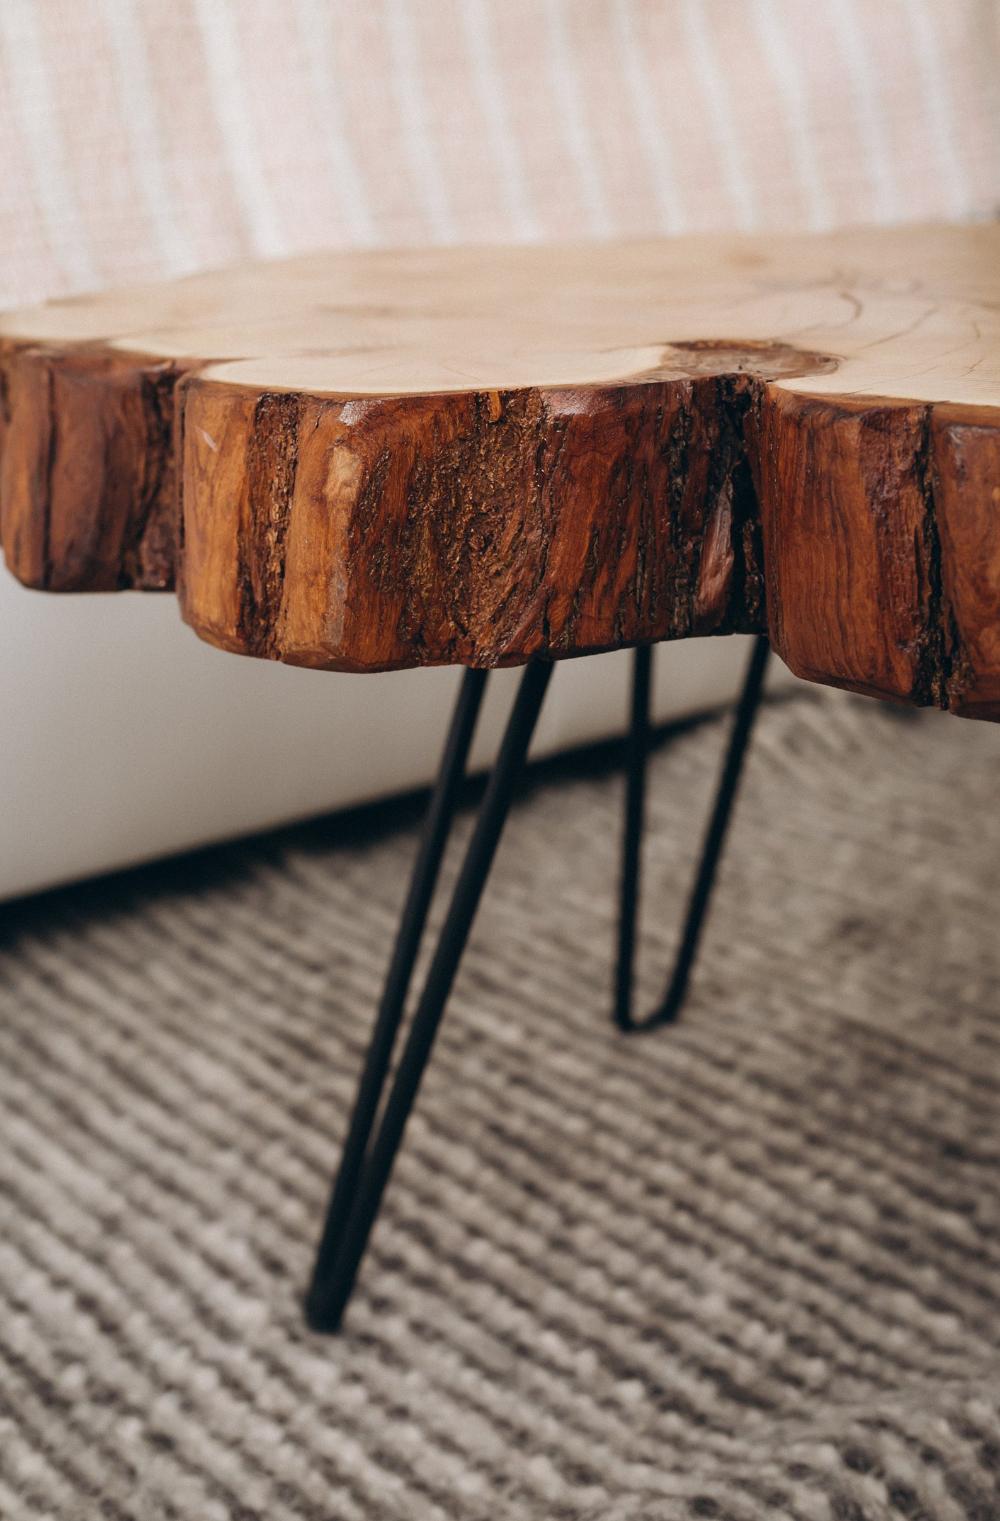 Live Edge Coffee Table Unique Coffee Table Slab Round Coffee Table Wood Coffee Table Wood Side Table End Table Modern Coffee Table In 2020